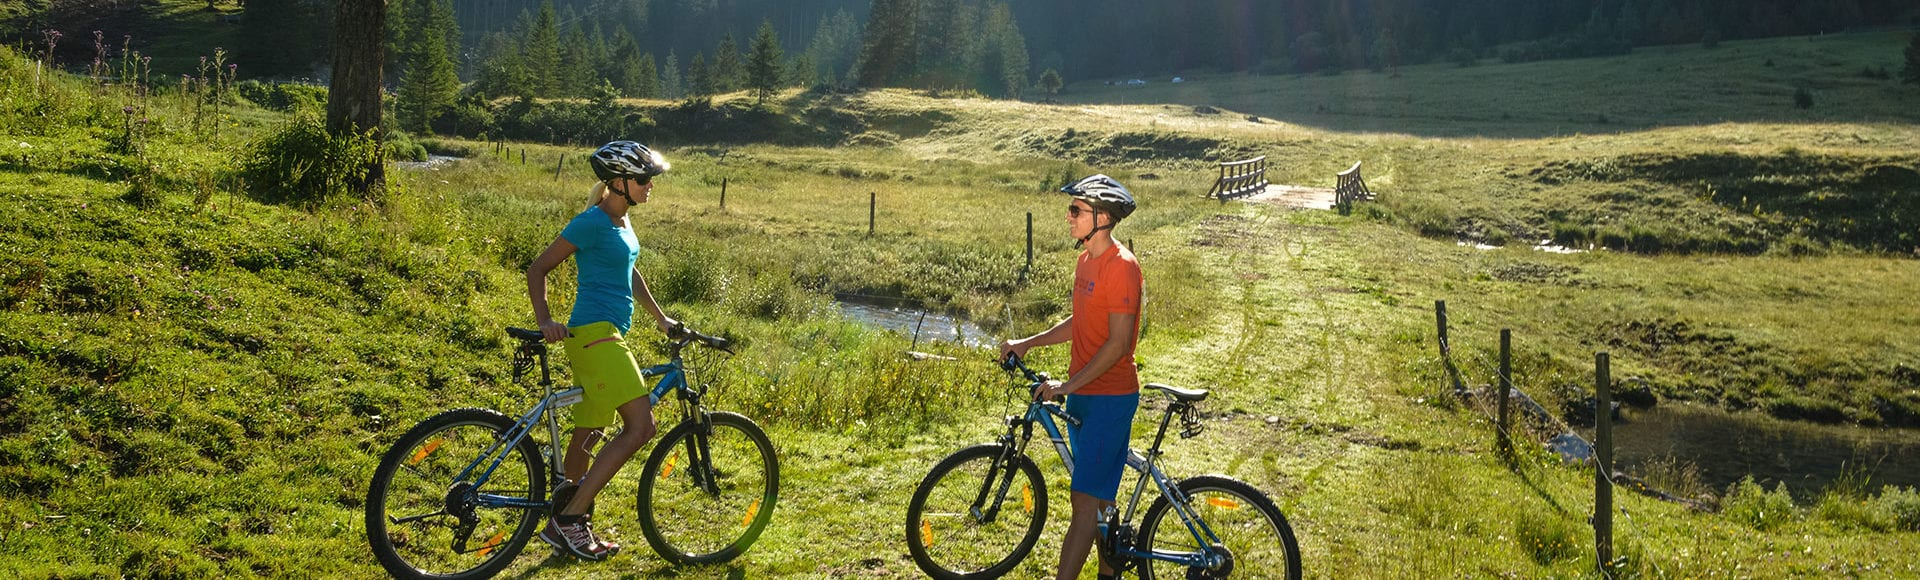 Mountainbike in Obertauern